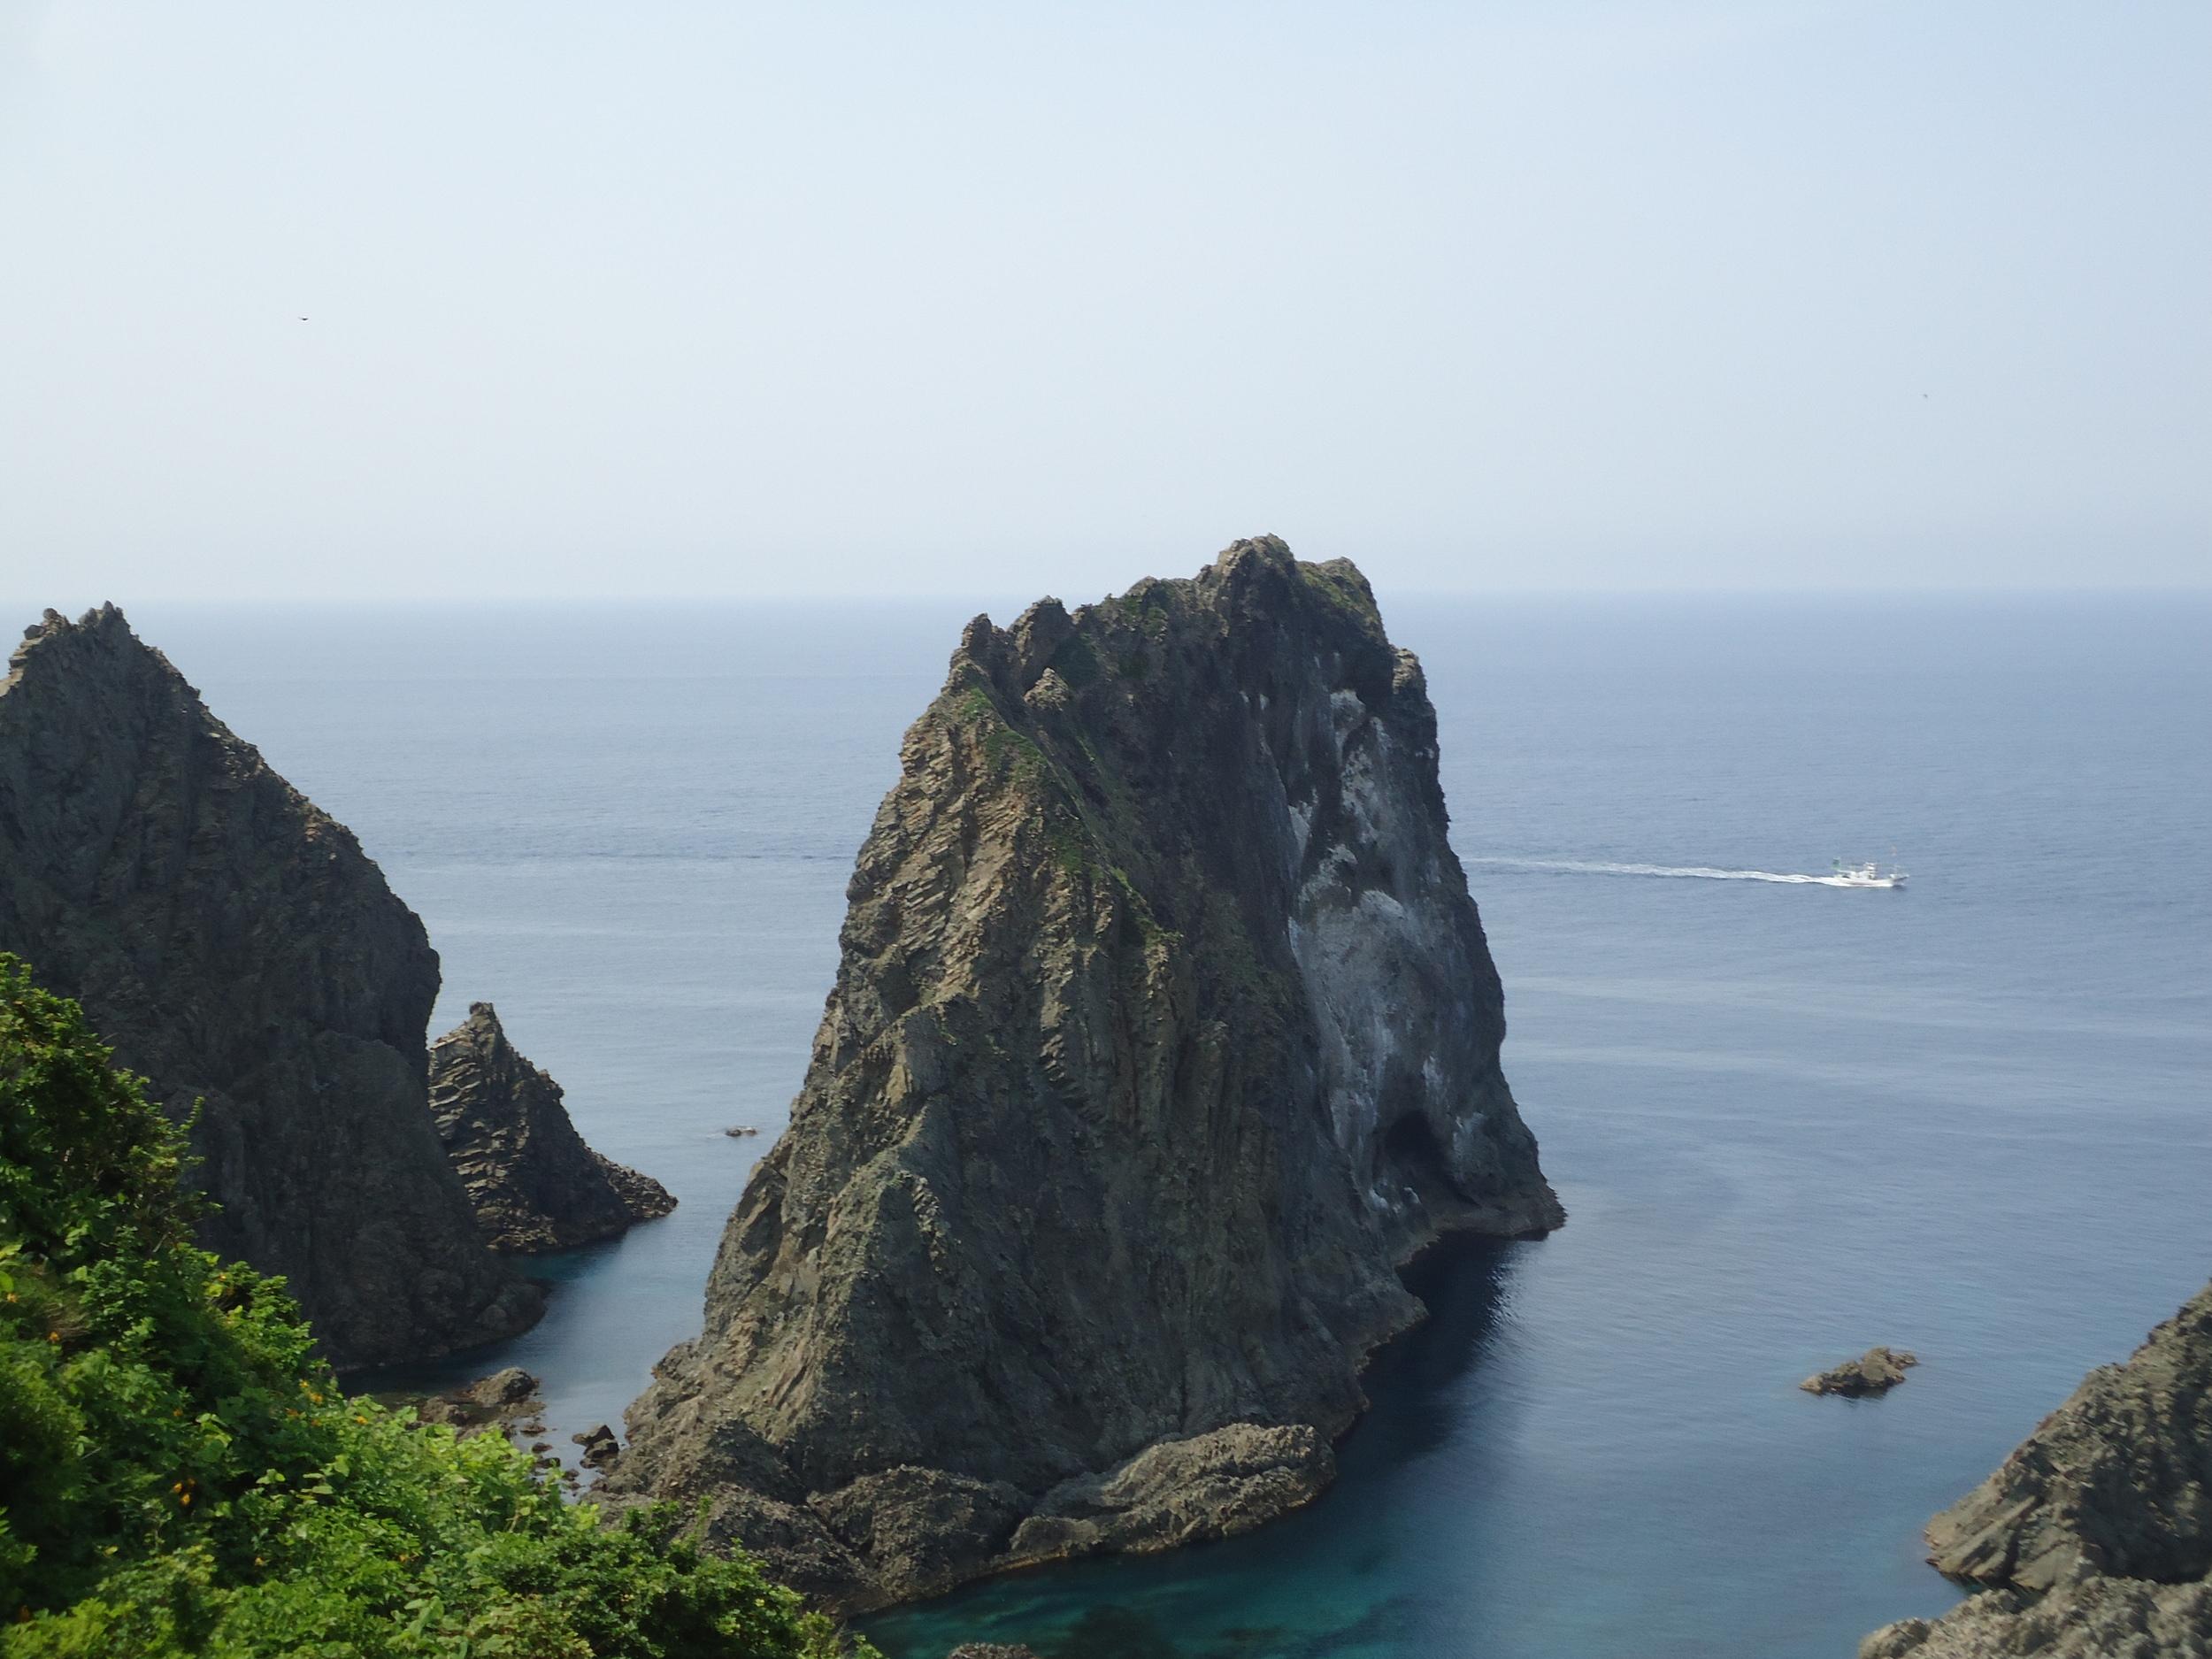 Shimamui Coast rock island